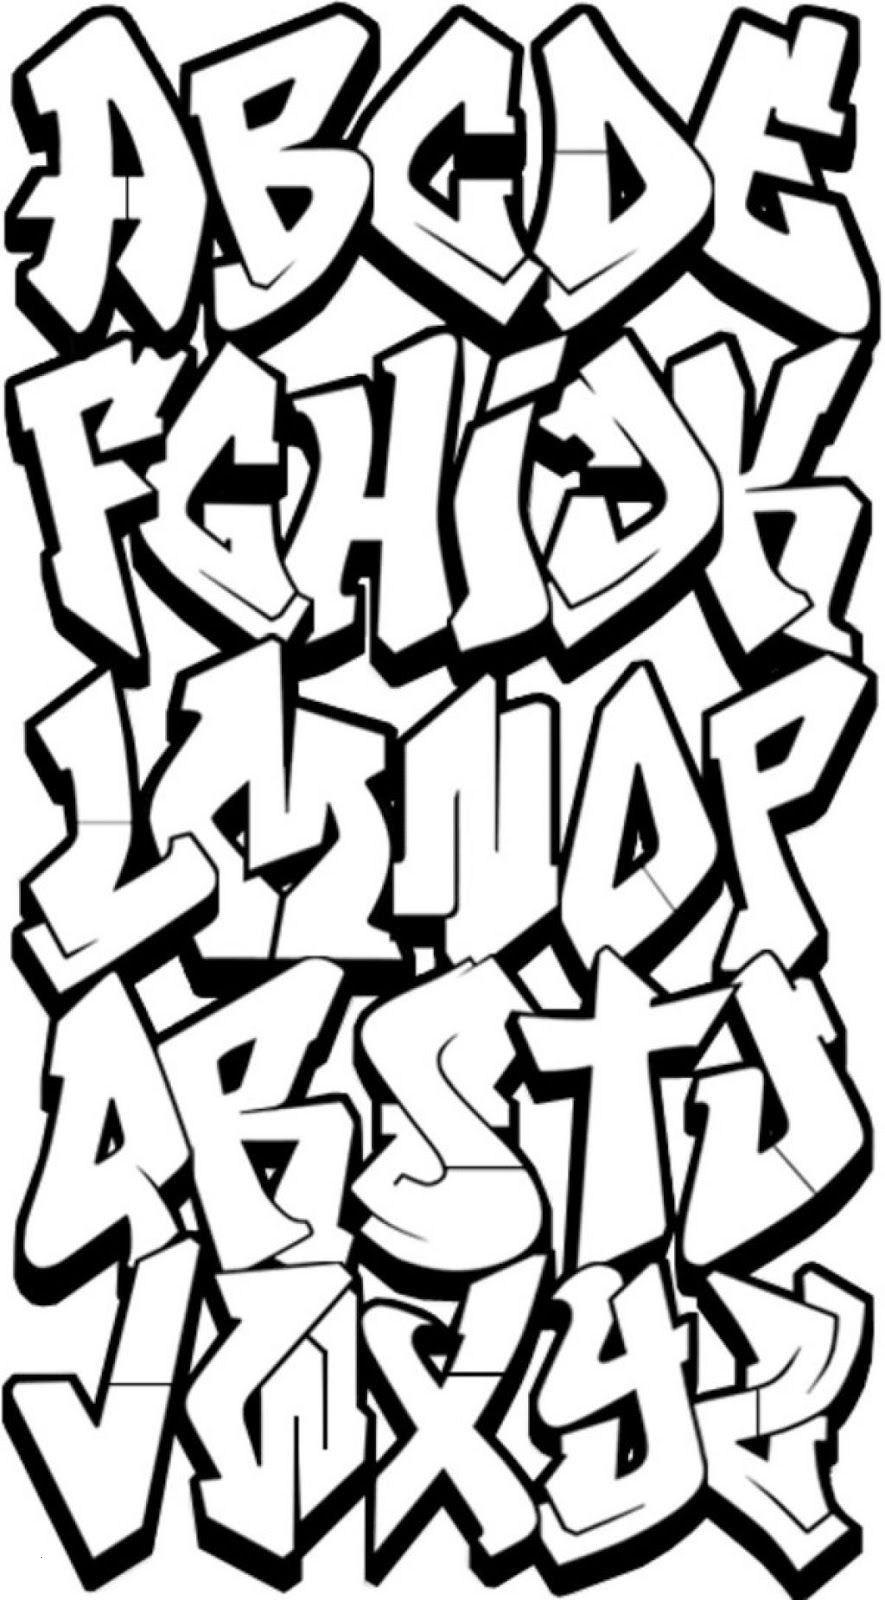 Graffiti Ausmalbilder Namen Genial Graffiti Ausmalbilder Schön How to Make A Grafitti Buscar Con Google Fotos